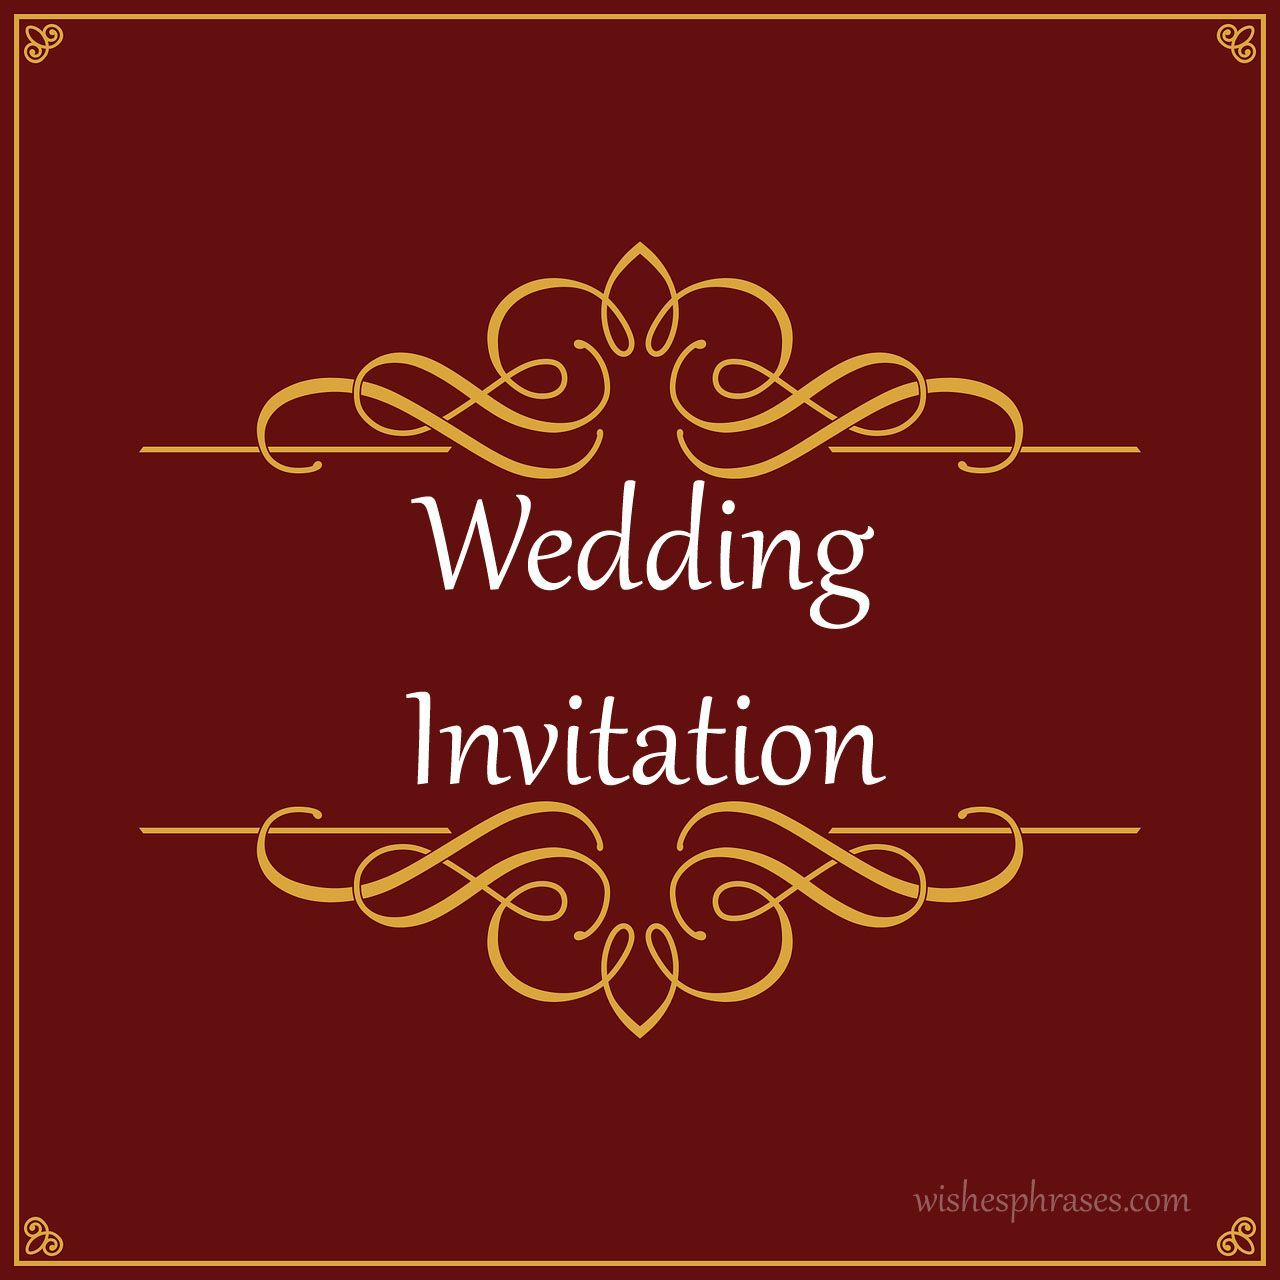 Exelent Sample Destination Wedding Invitations Images - Invitations ...